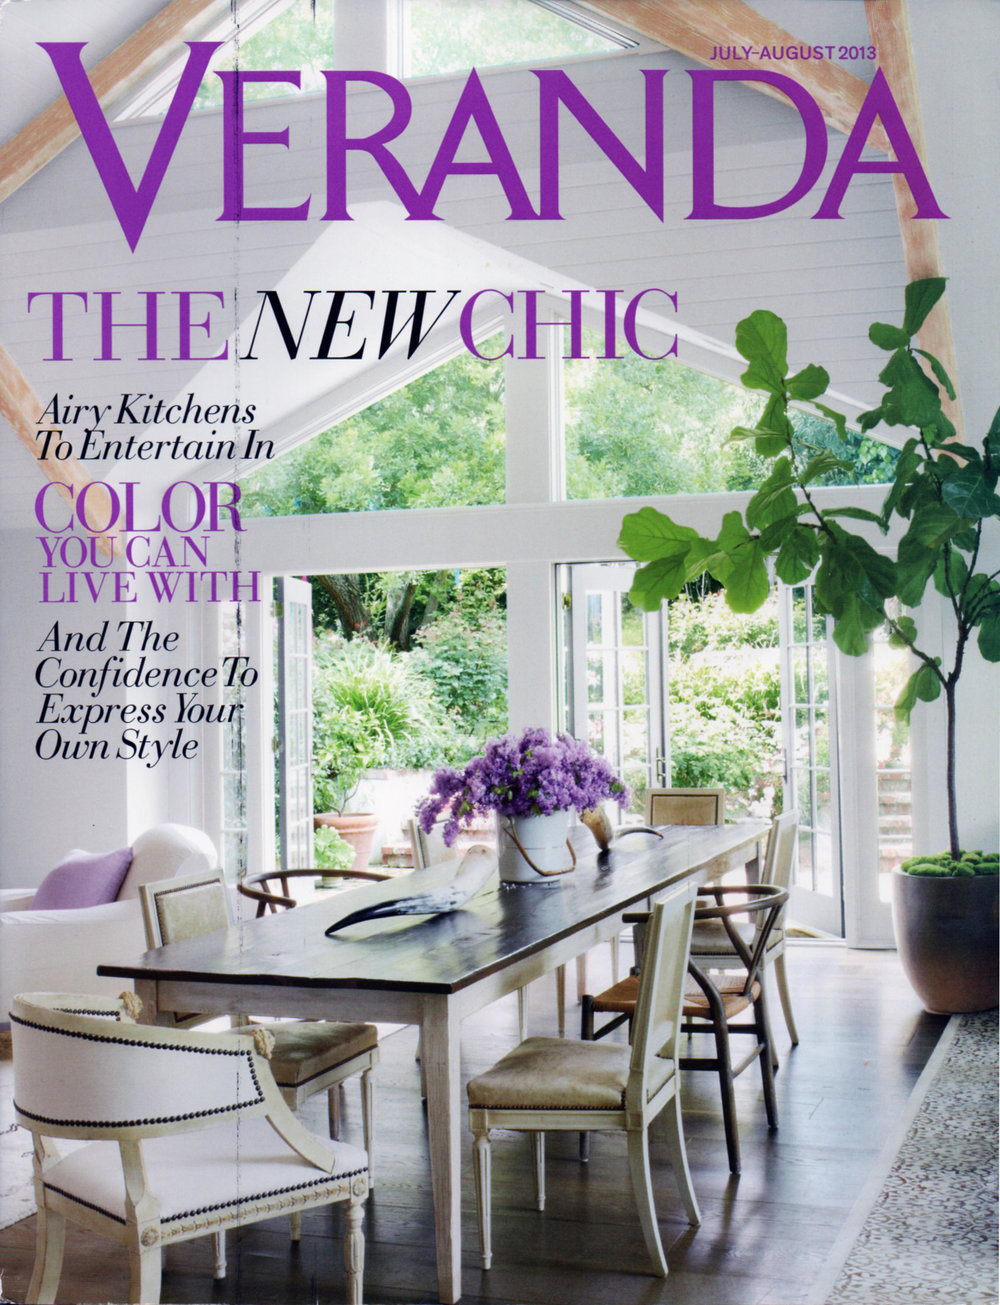 veranda cover 7:13.jpeg